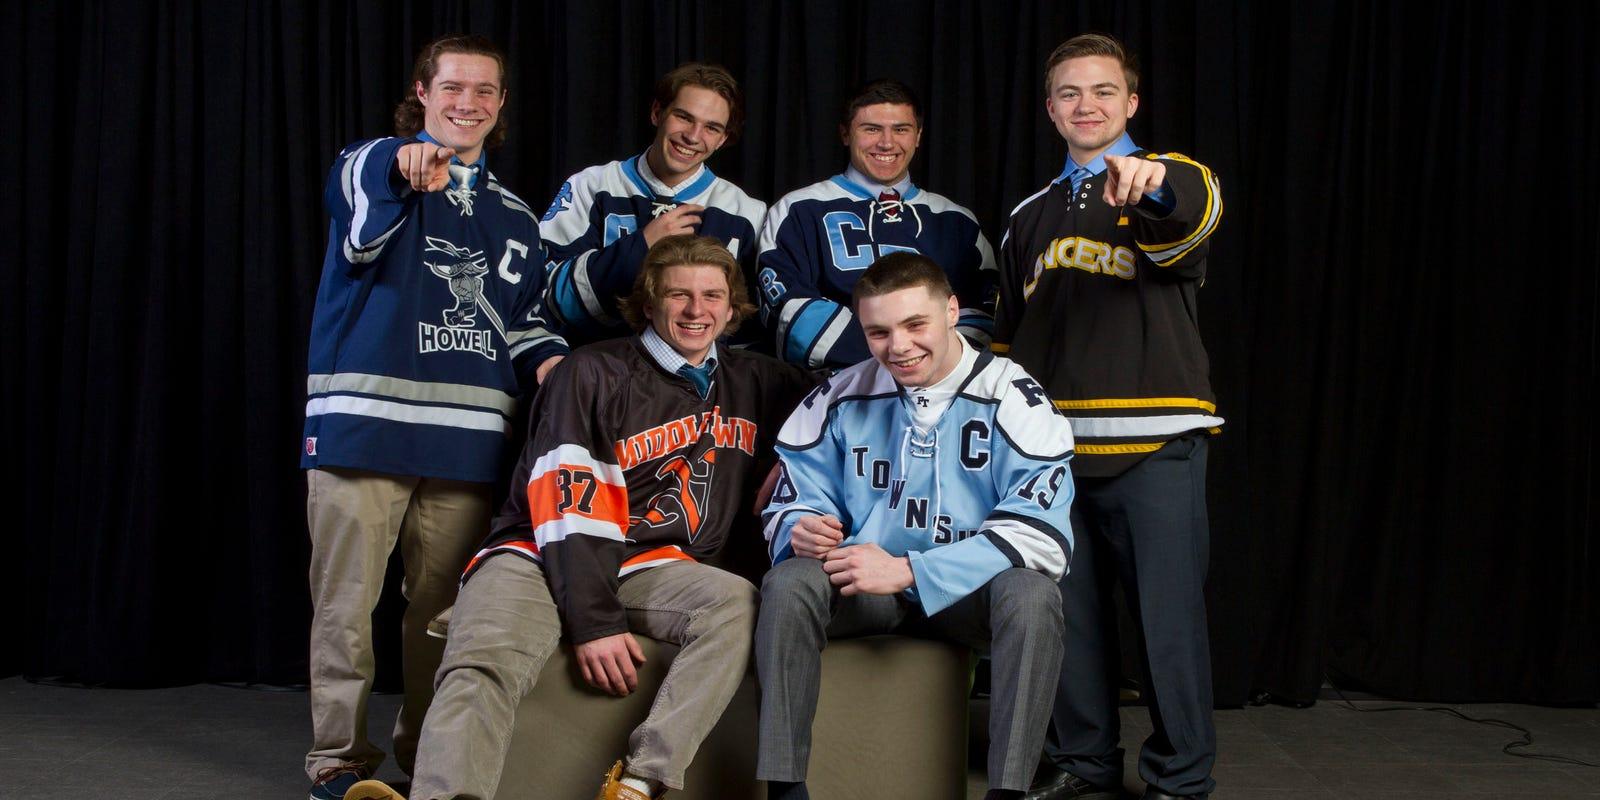 Meet the 2015 All-Shore Ice Hockey Team